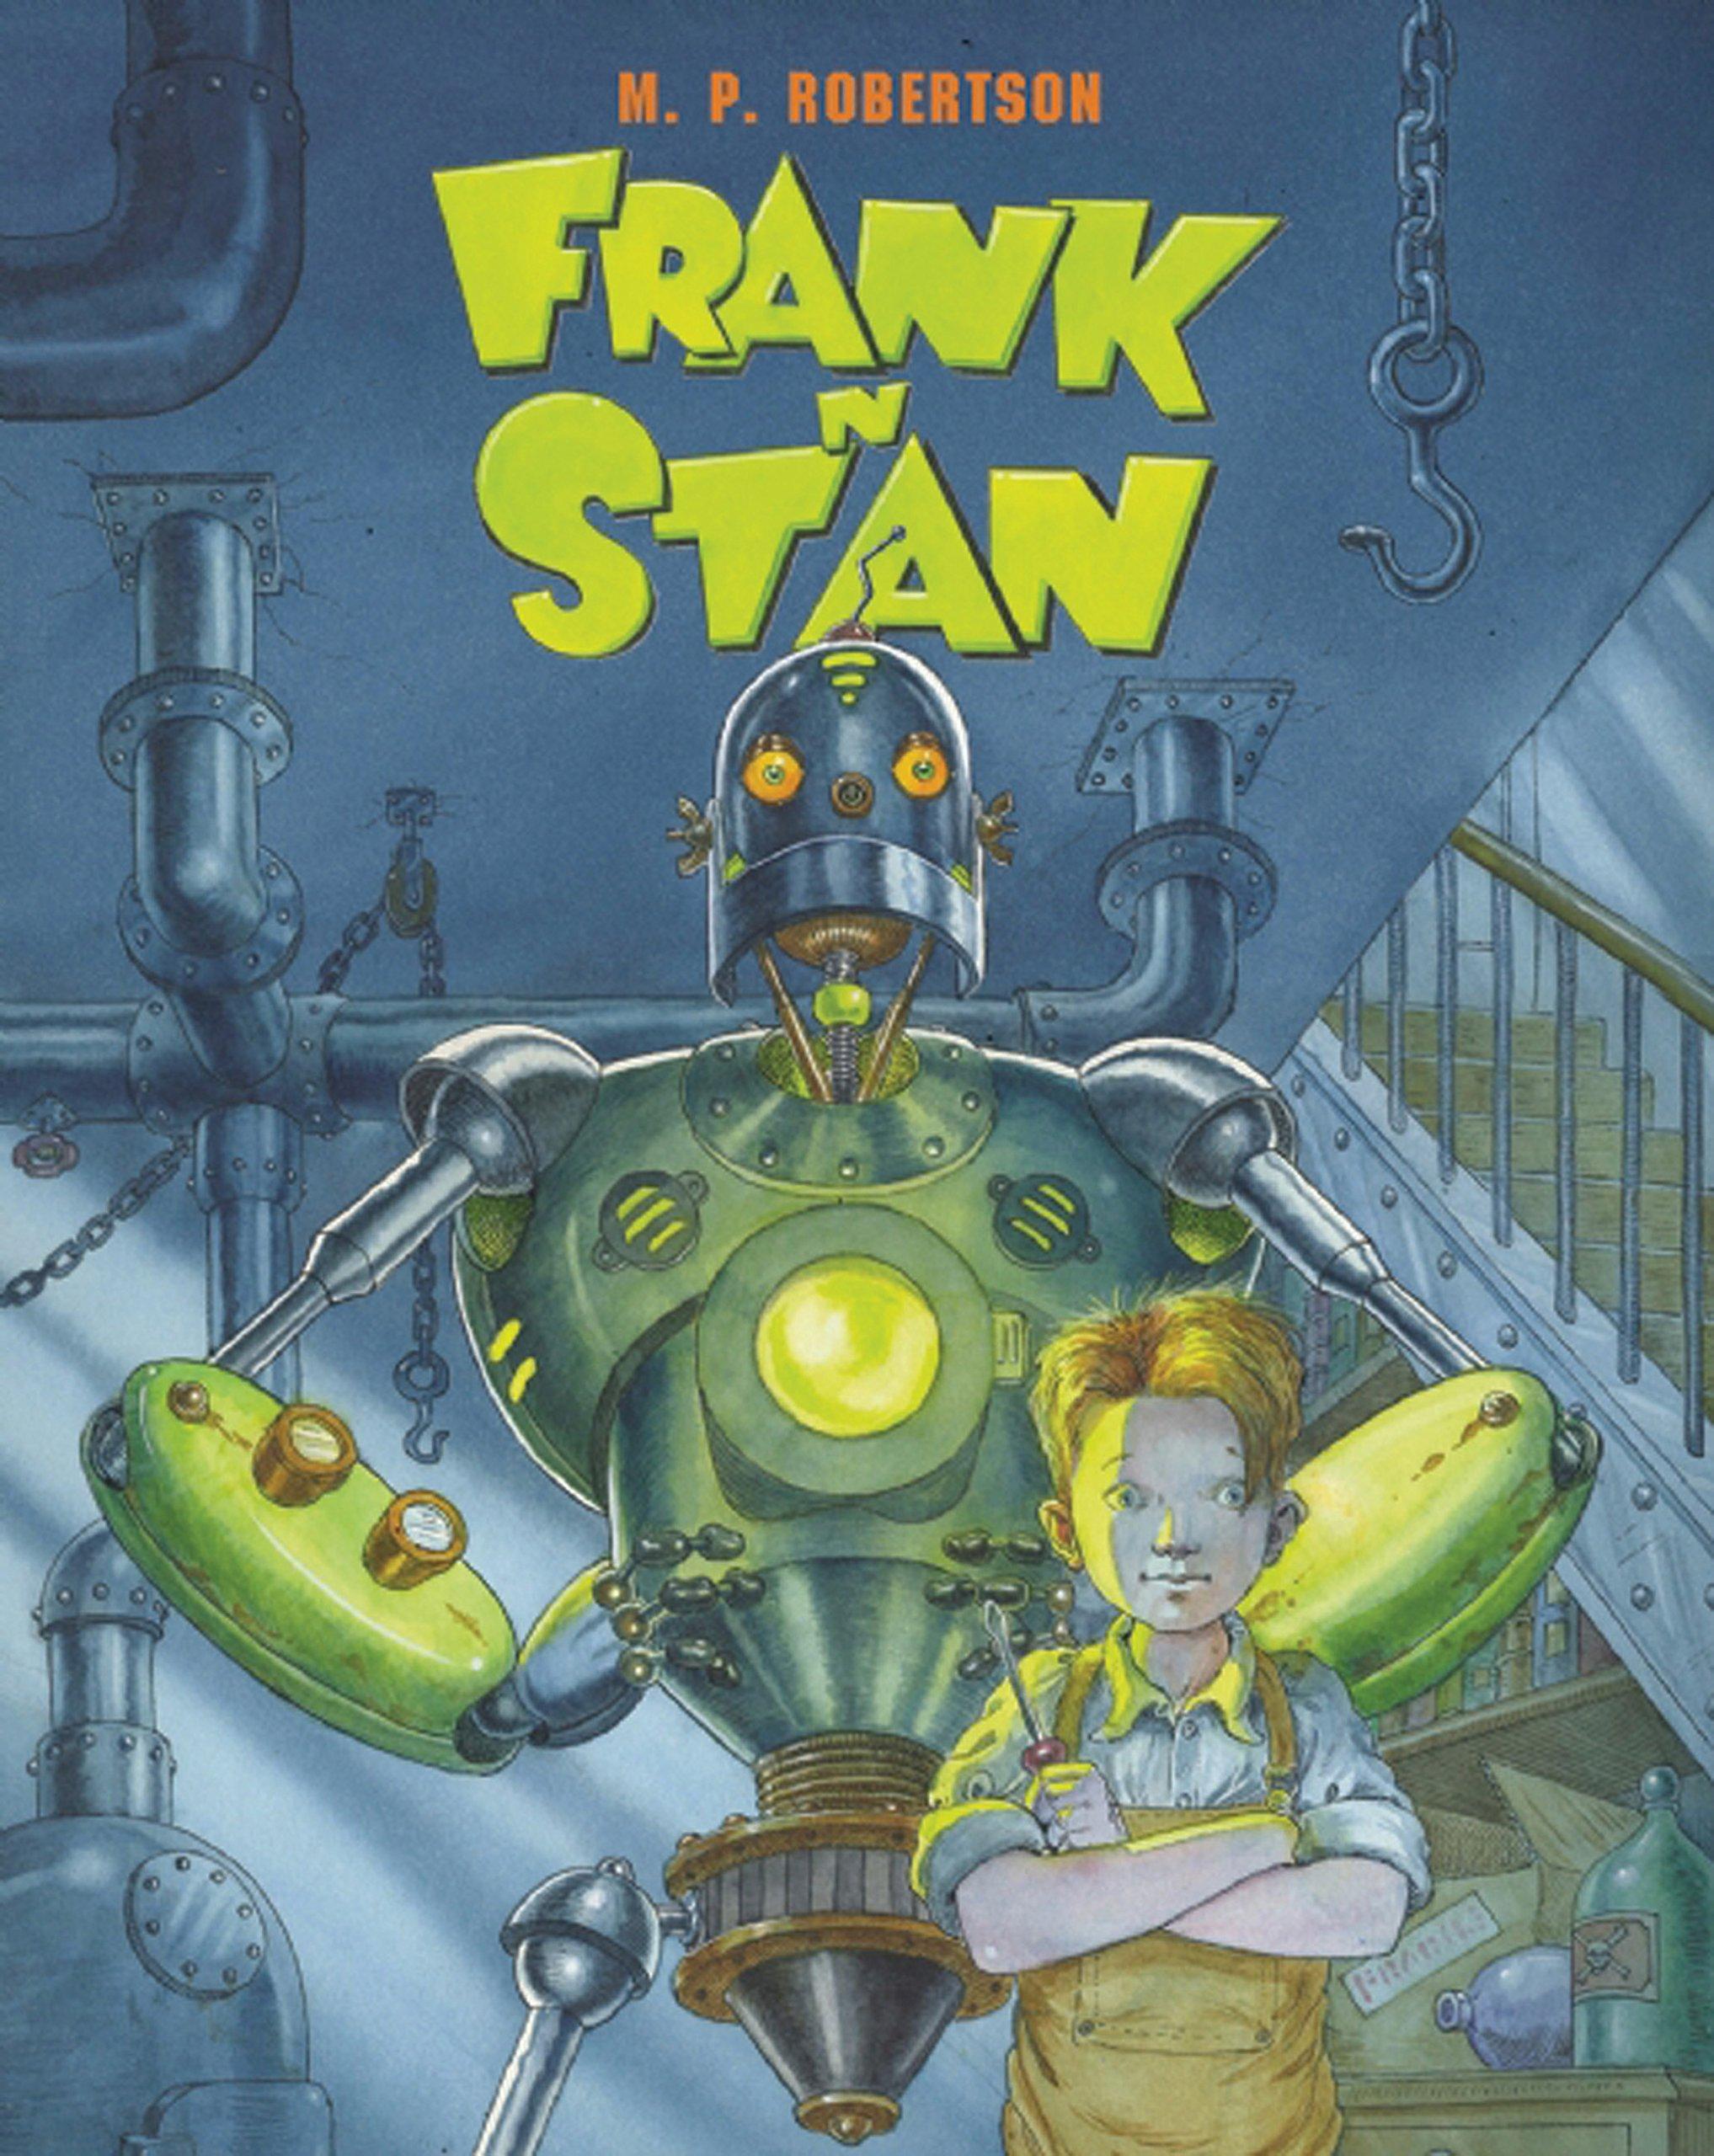 Amazon.com: Frank\'n\'Stan (9781847801609): M. P. Robertson: Books